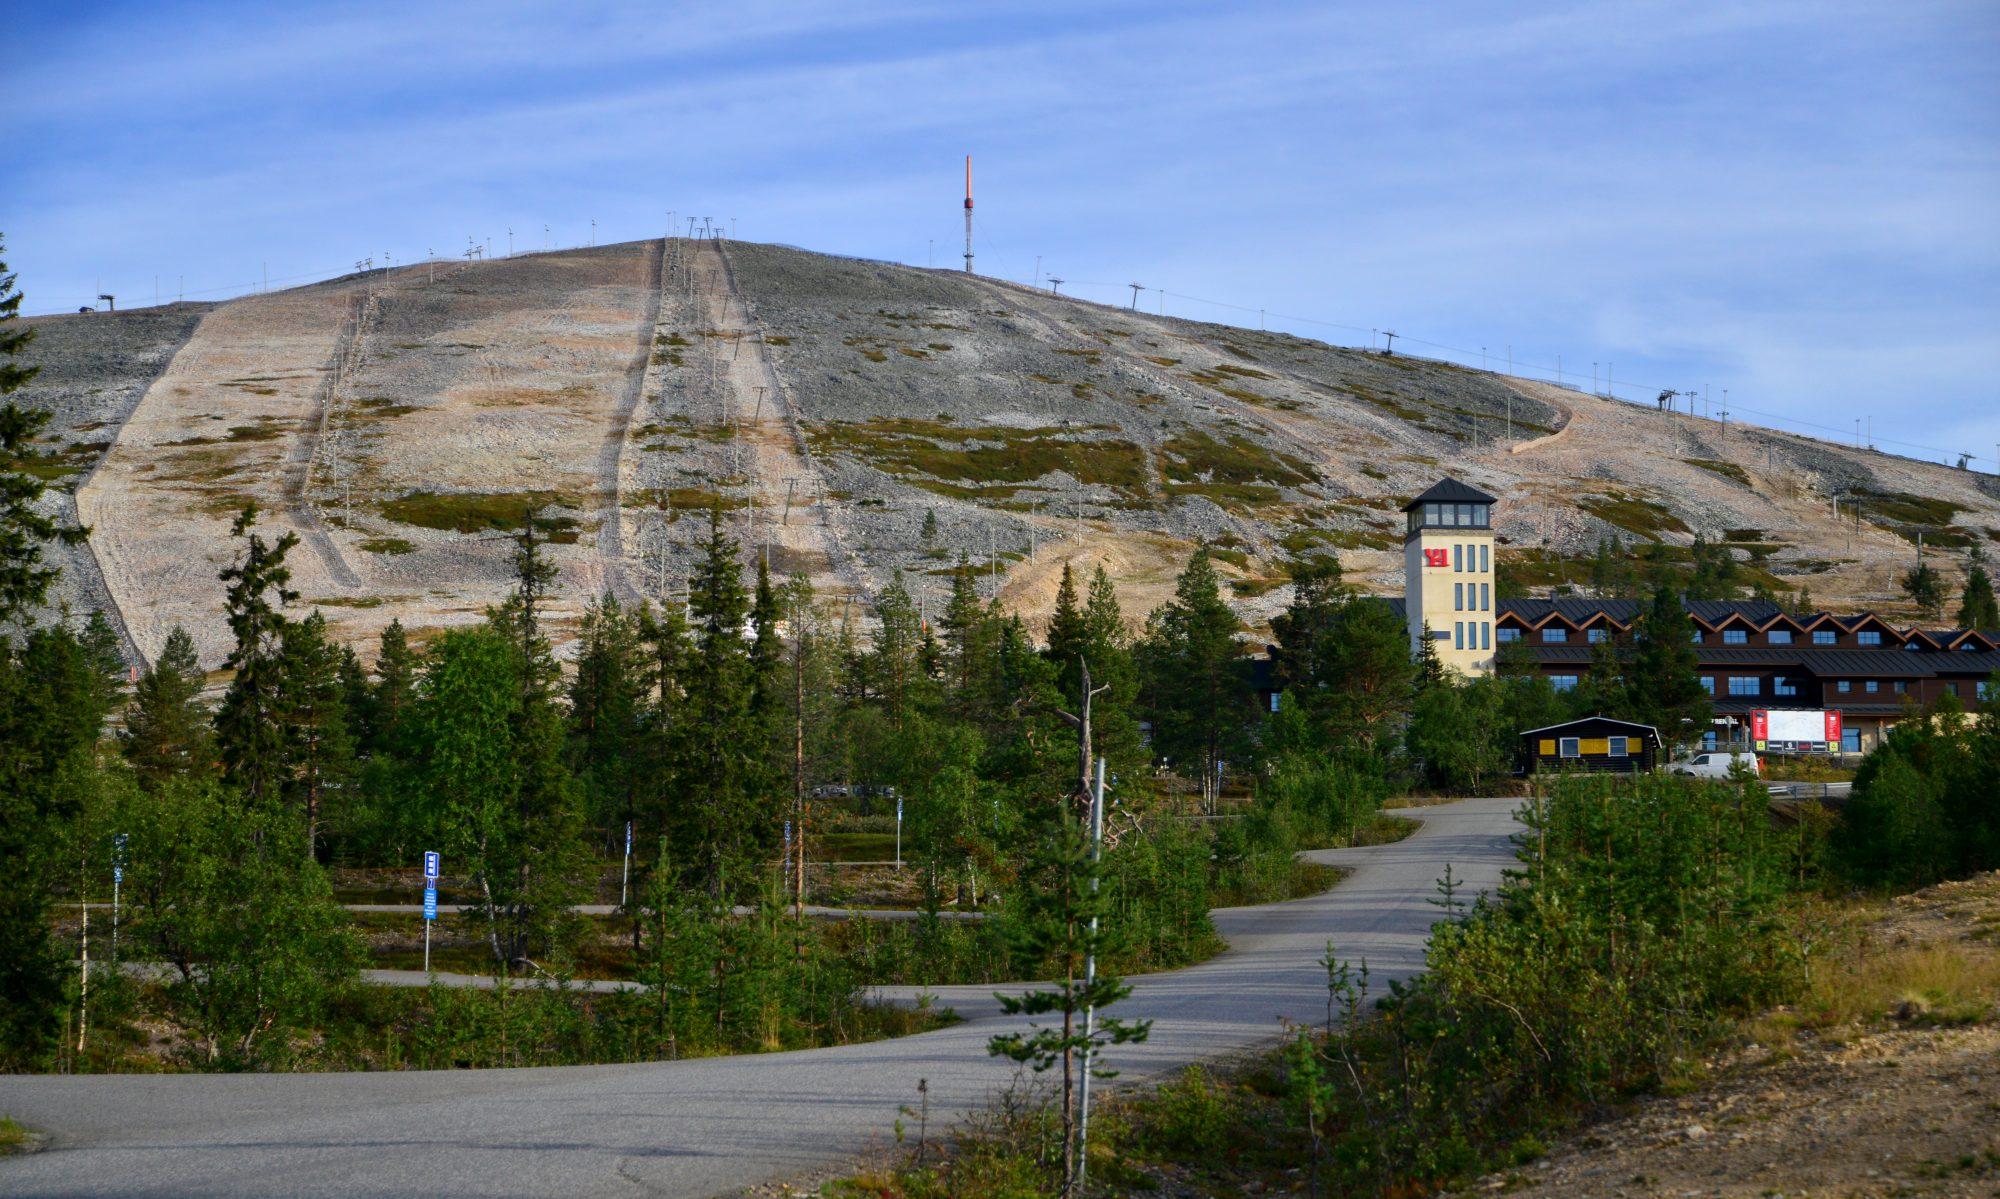 YLLÄS SKISTAR RACE 24-25.7.2020